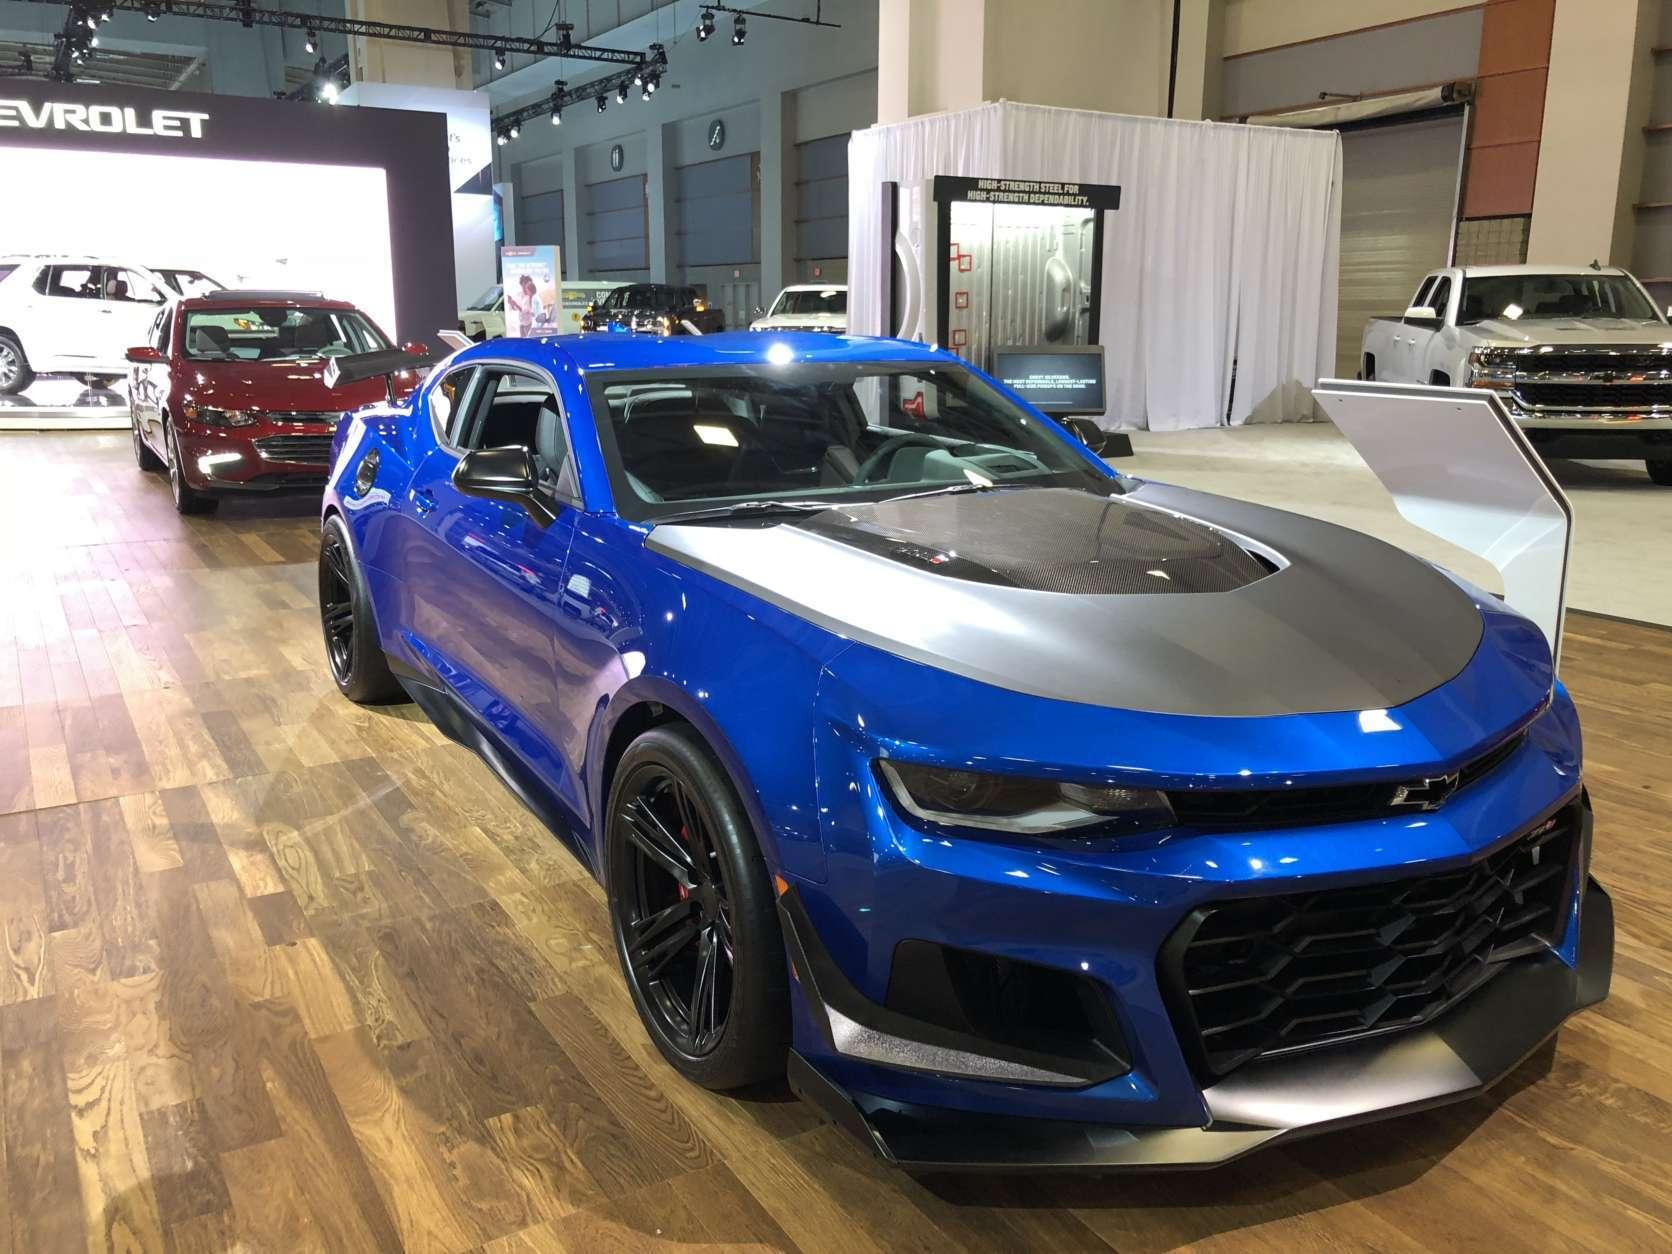 Auto Show Gives Car Shoppers Unique Chance To Kick Tires WTOP - Washington dc car show 2018